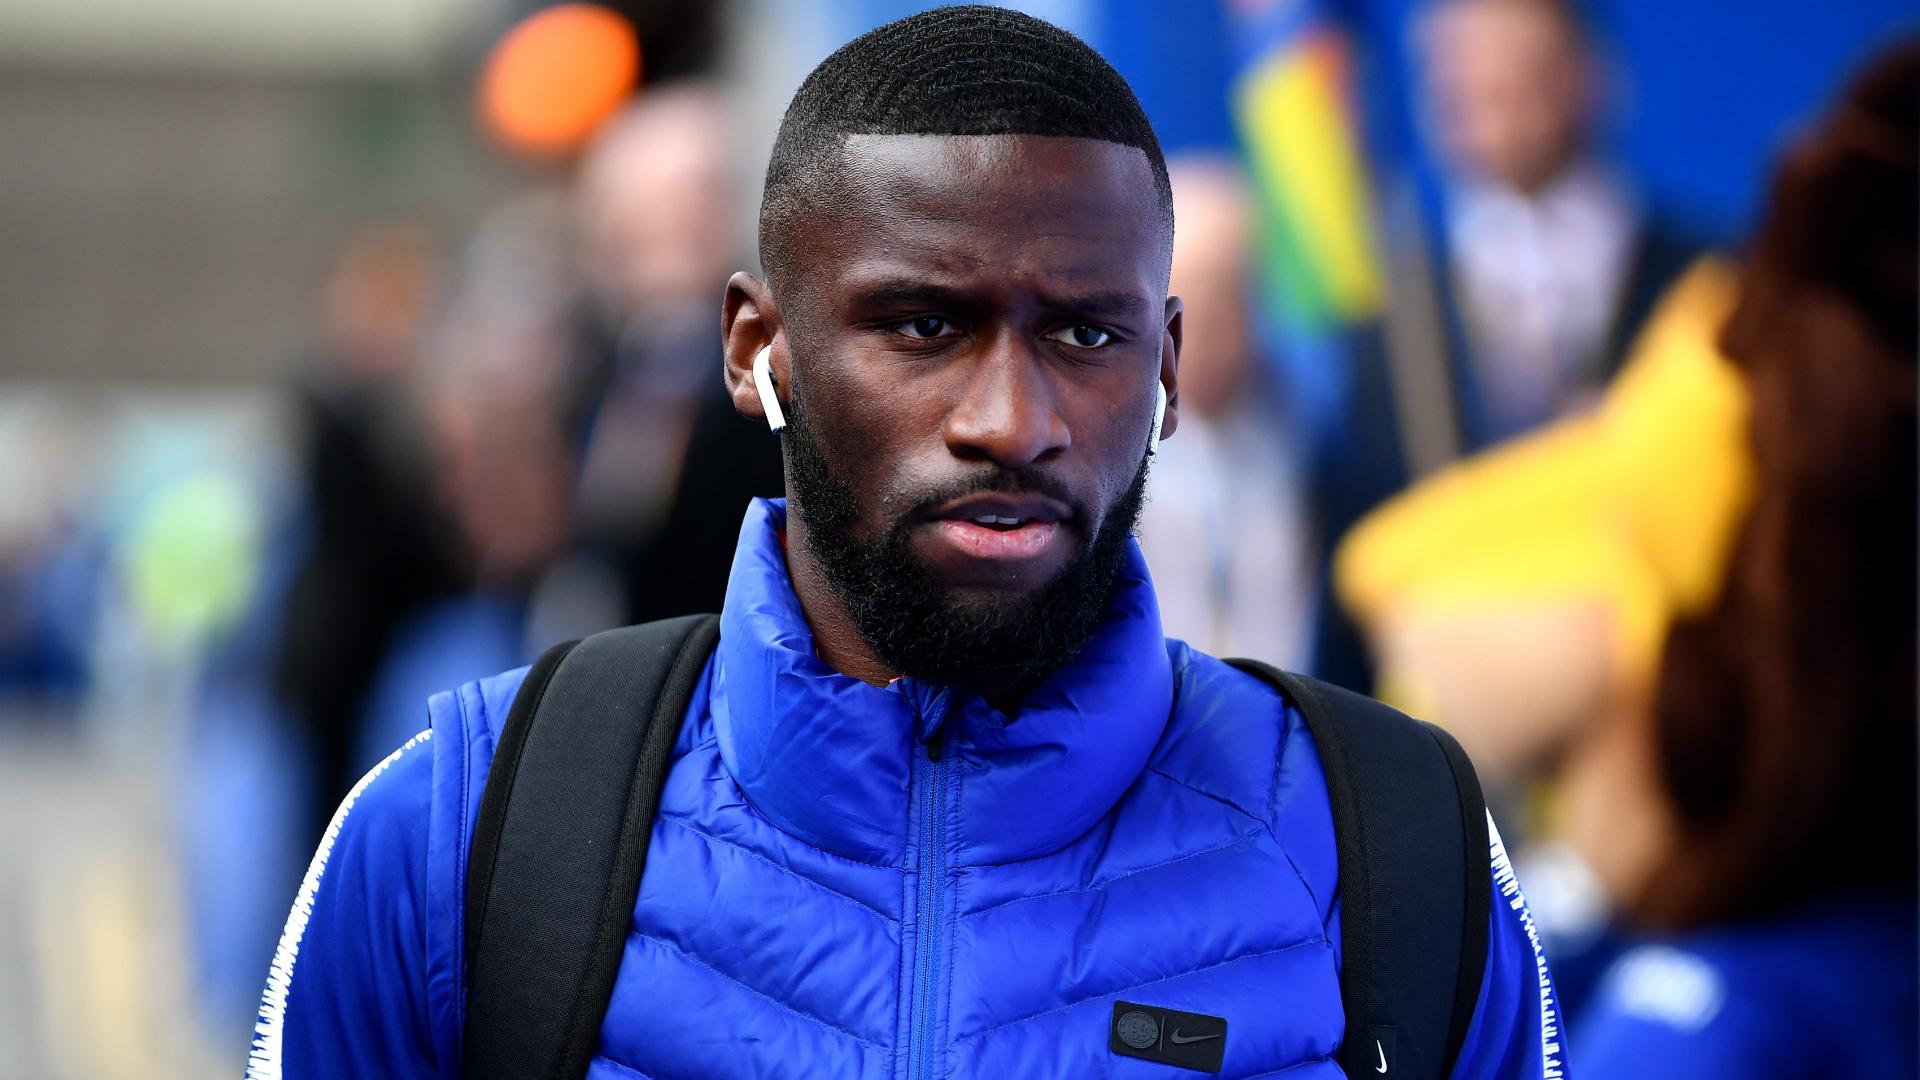 Spurs make in-stadium pleas against racism after Rudiger incident